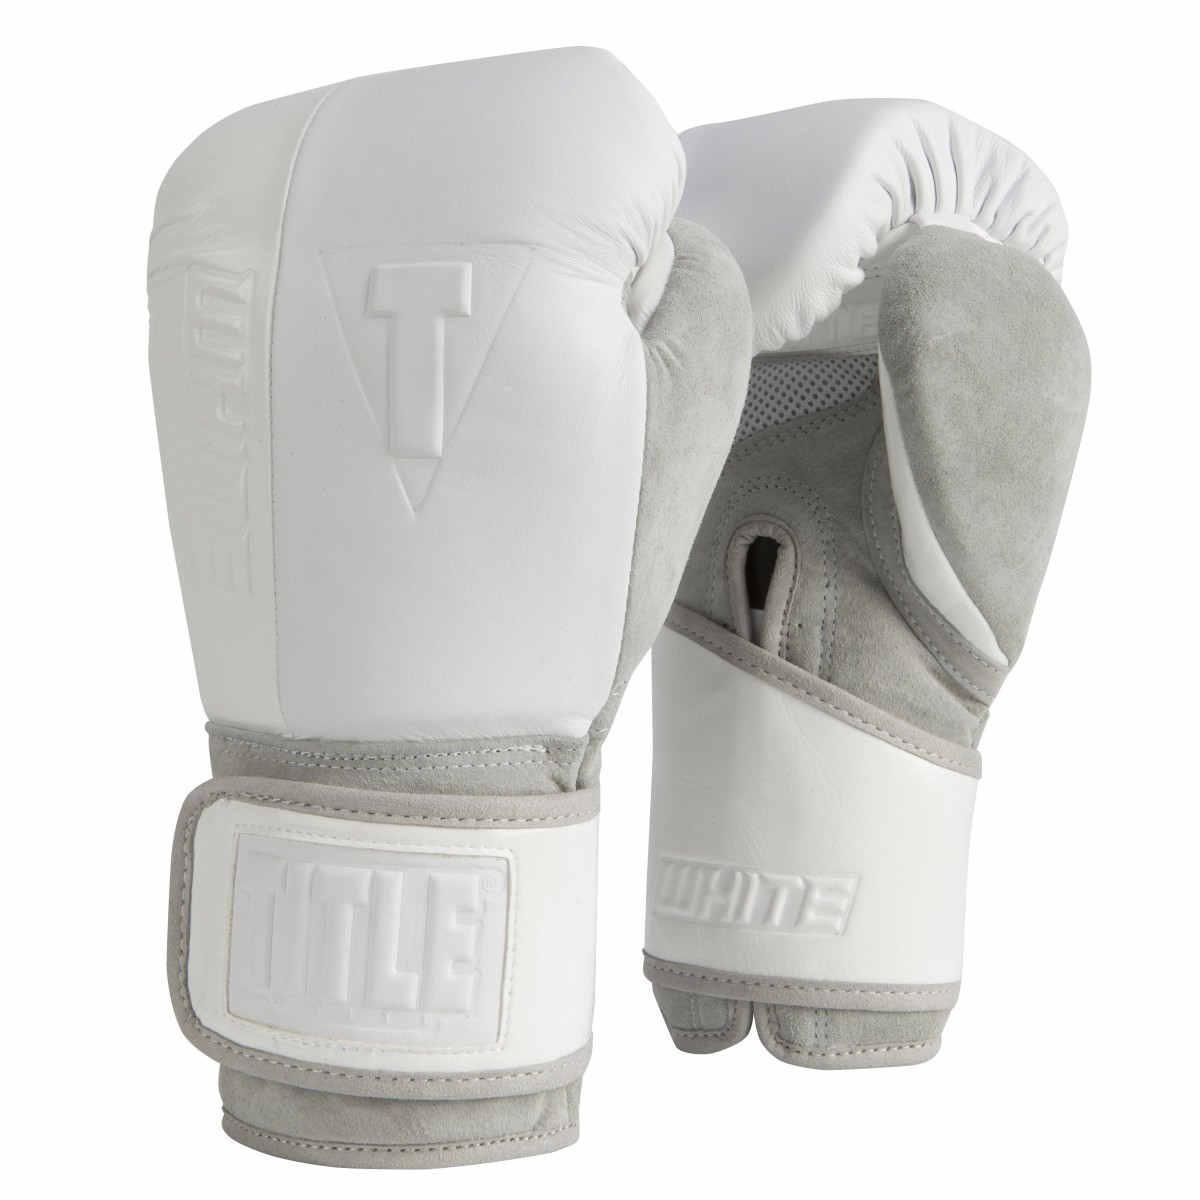 Боксерські рукавички TITLE WHITE Training Gloves